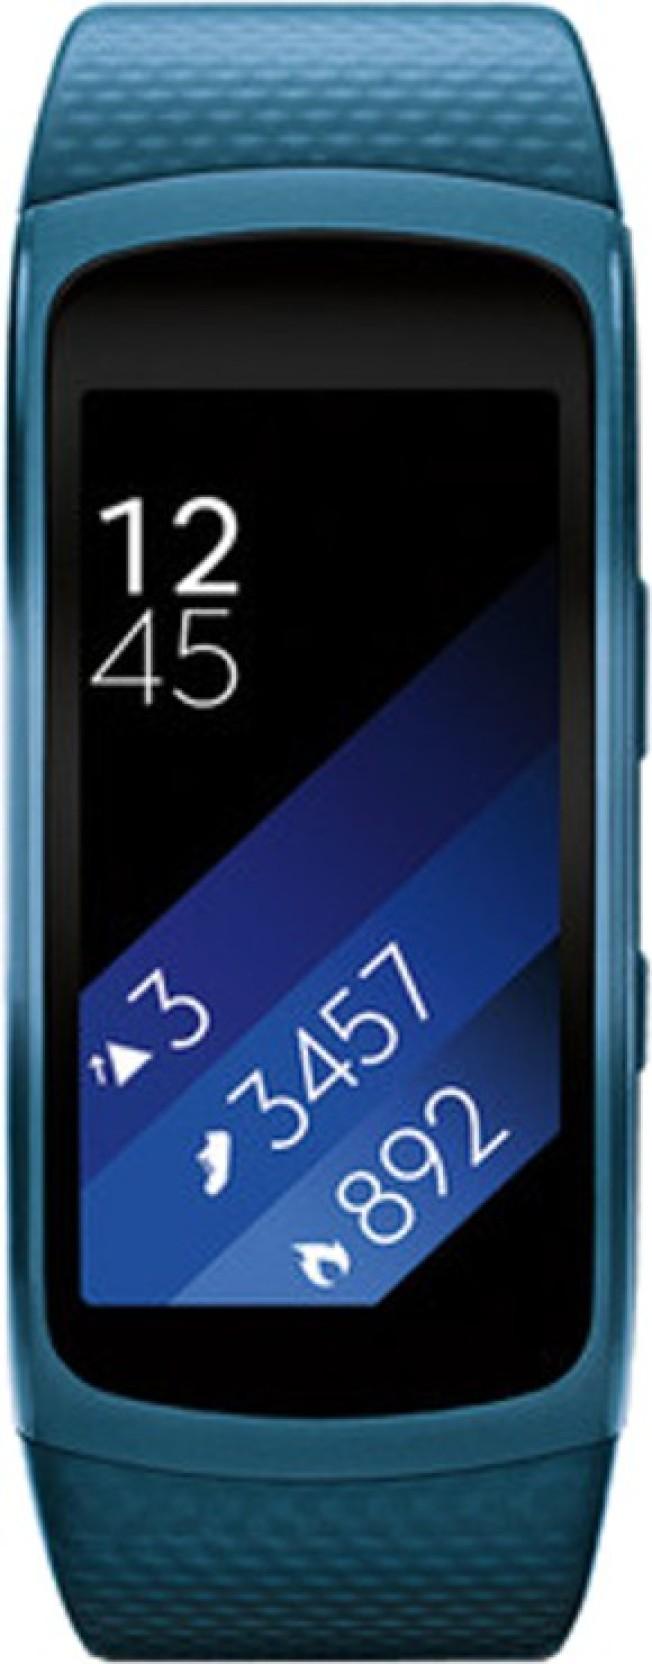 SAMSUNG Gear Fit 2 Blue Smartwatch(Blue)